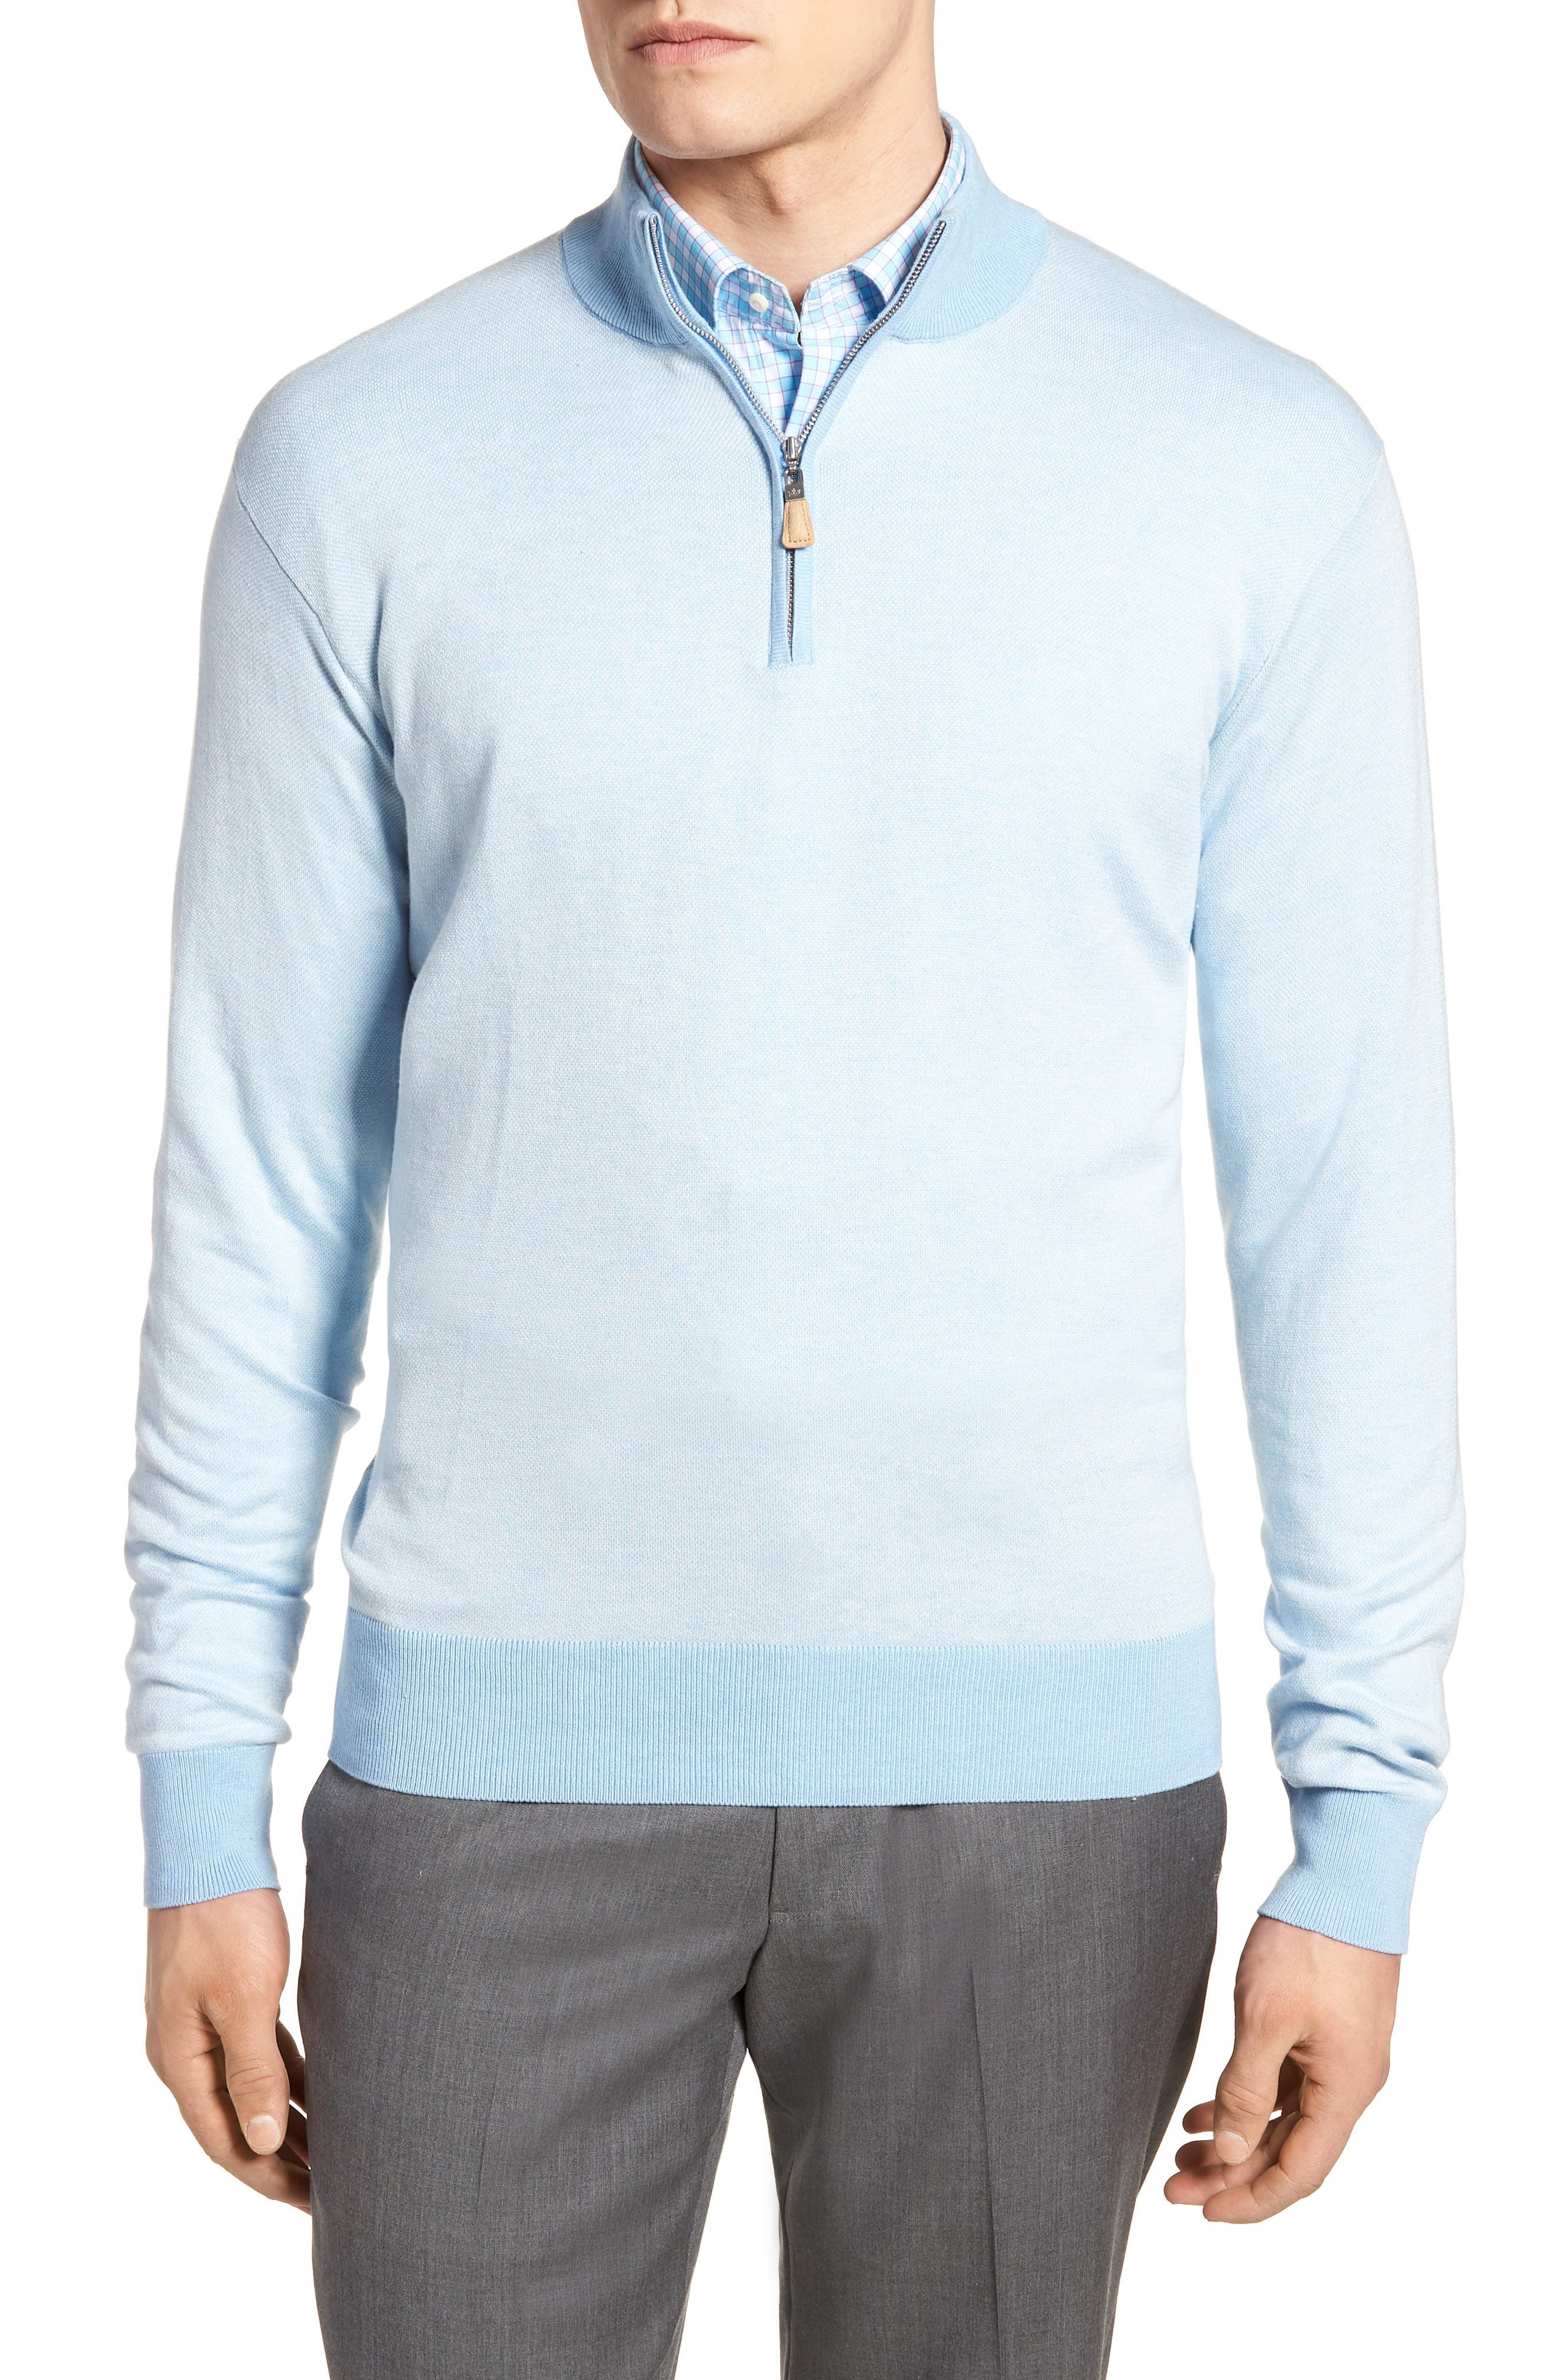 Crown Bird's Eye Cotton & Silk Quarter Zip Sweater,                             Main thumbnail 1, color,                             453